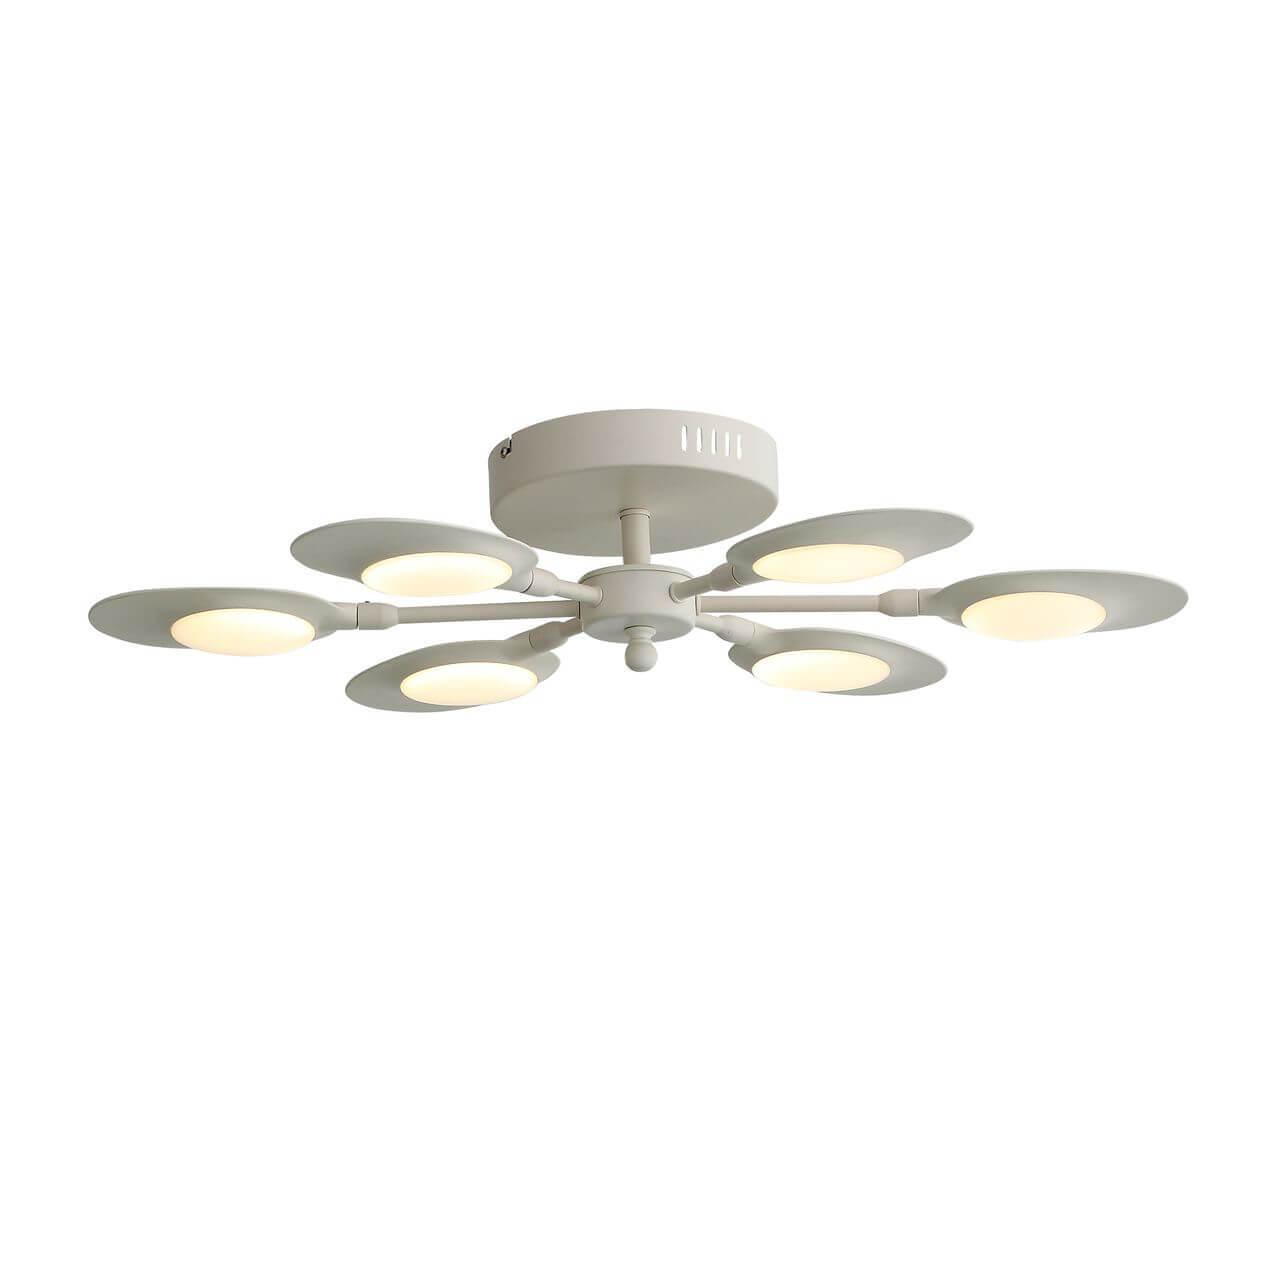 цена на Потолочная светодиодная люстра ST Luce Farfalla SL824.502.06